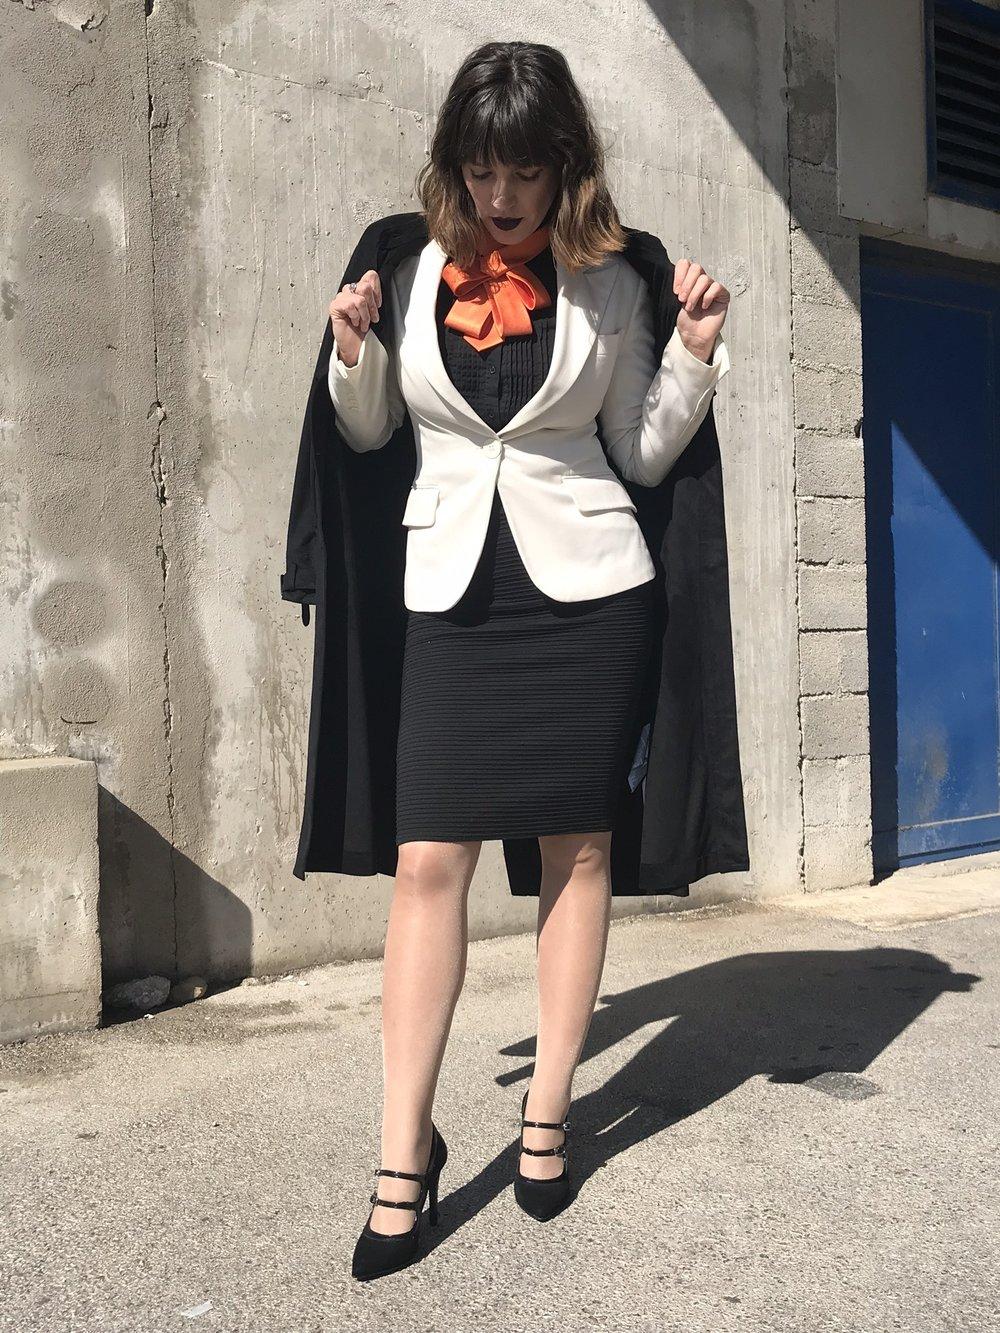 Professional Business Dress Code